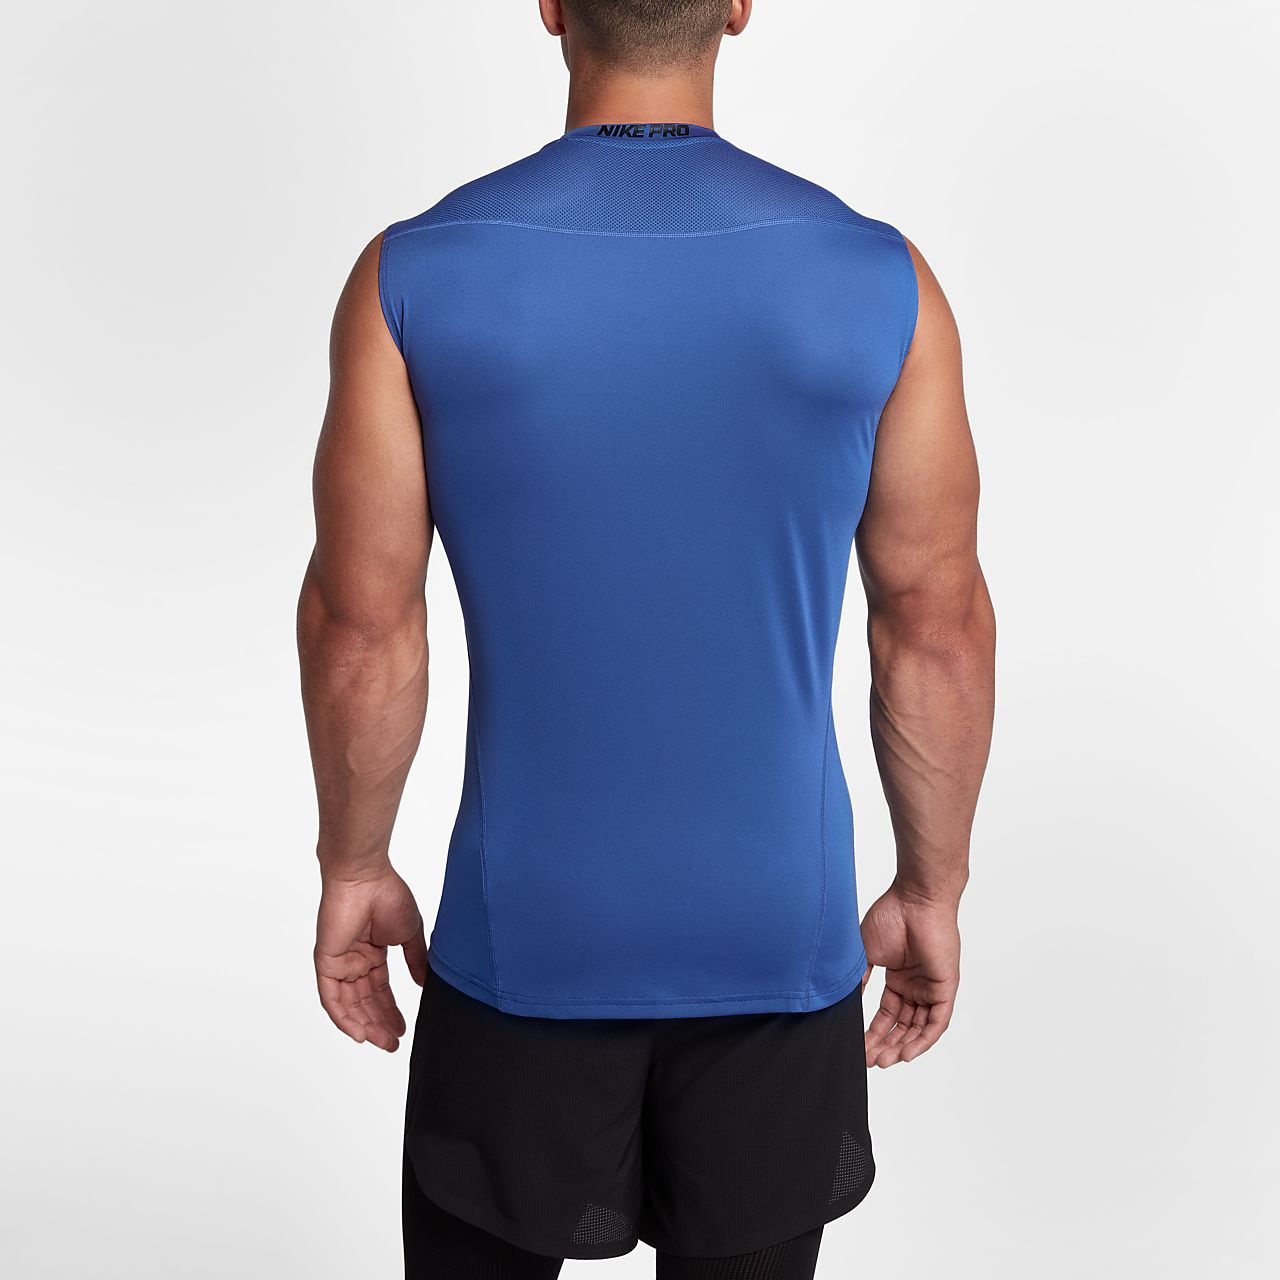 best sleeveless workout shirts